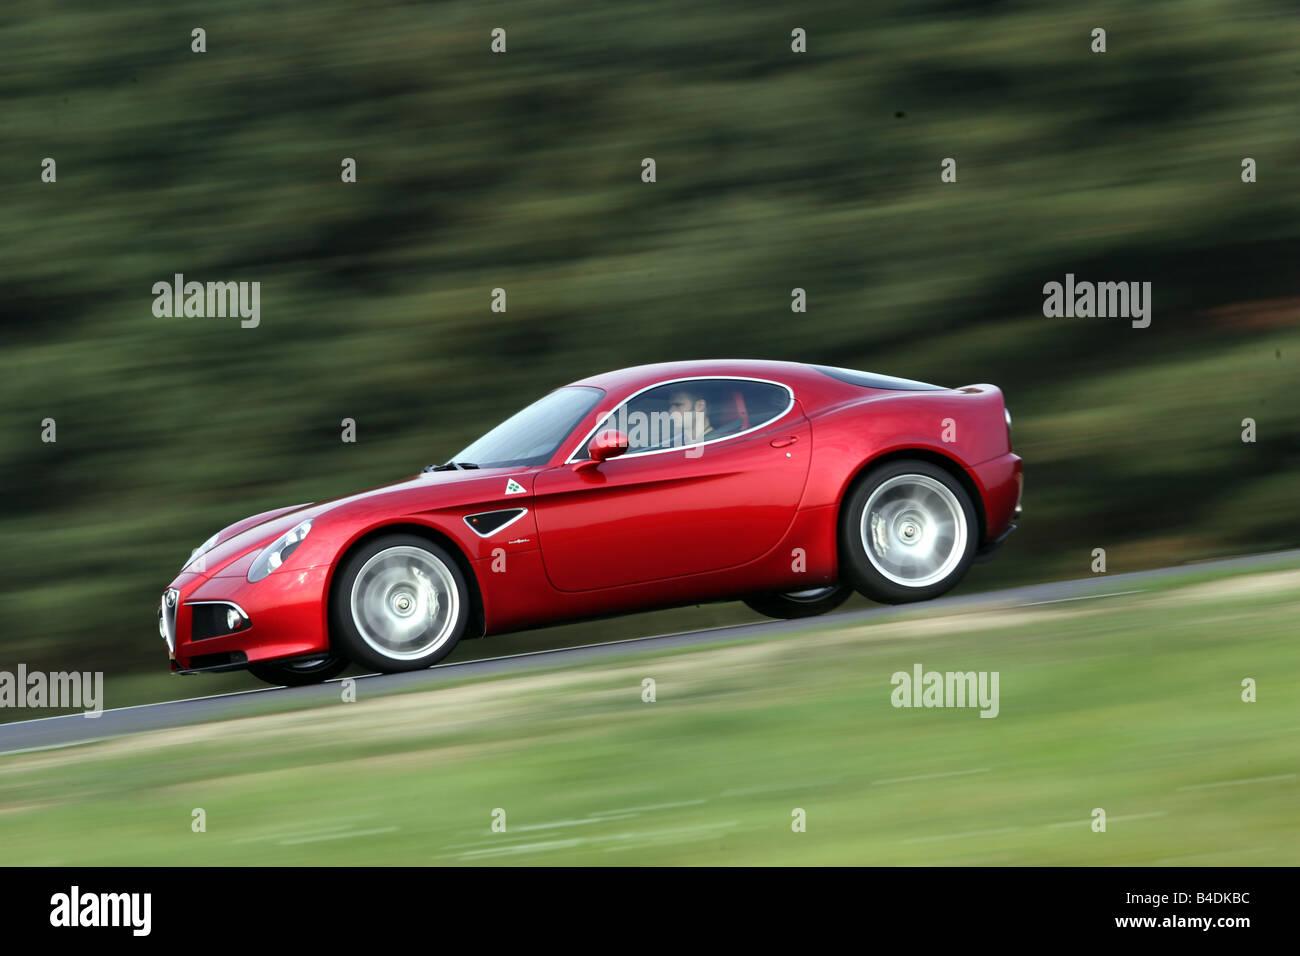 Alfa Romeo 8C, Modell 2007-rot, treibende, Side Jahresansicht, Teststrecke Stockbild